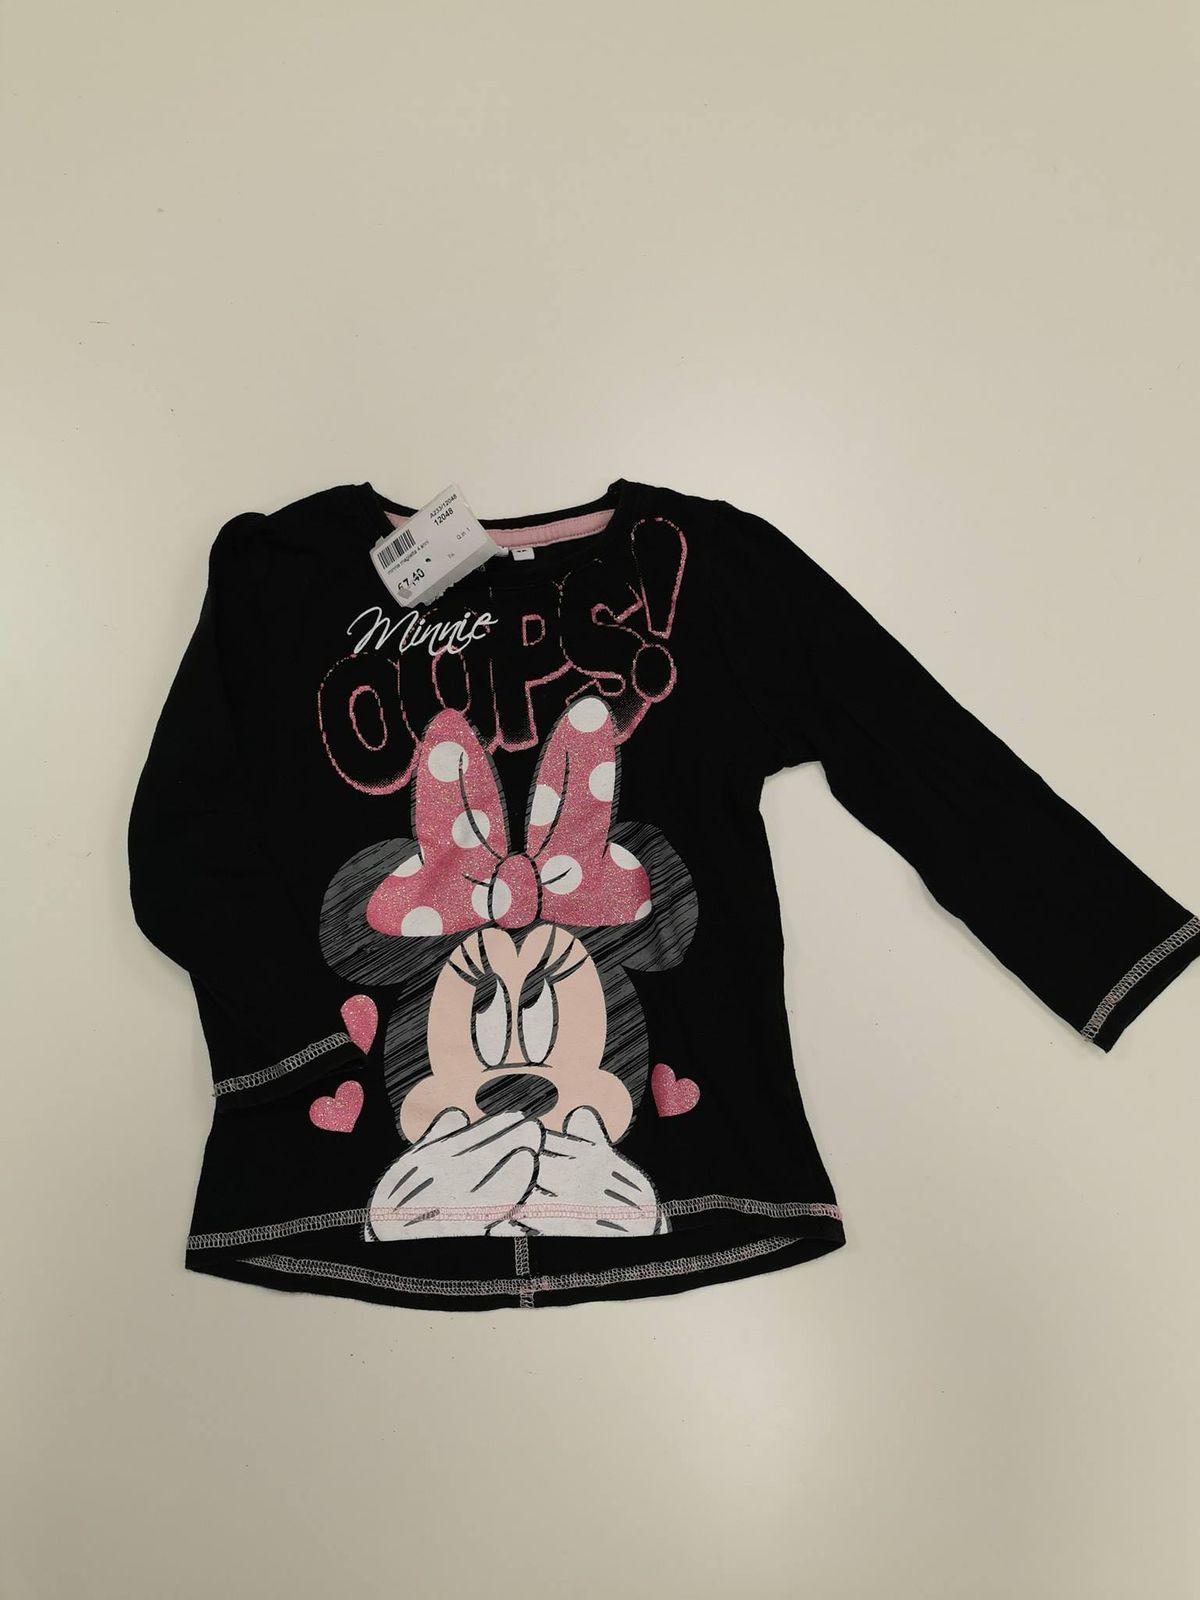 Minnie maglietta Bimba 4 anni 12048 Euro 7,40